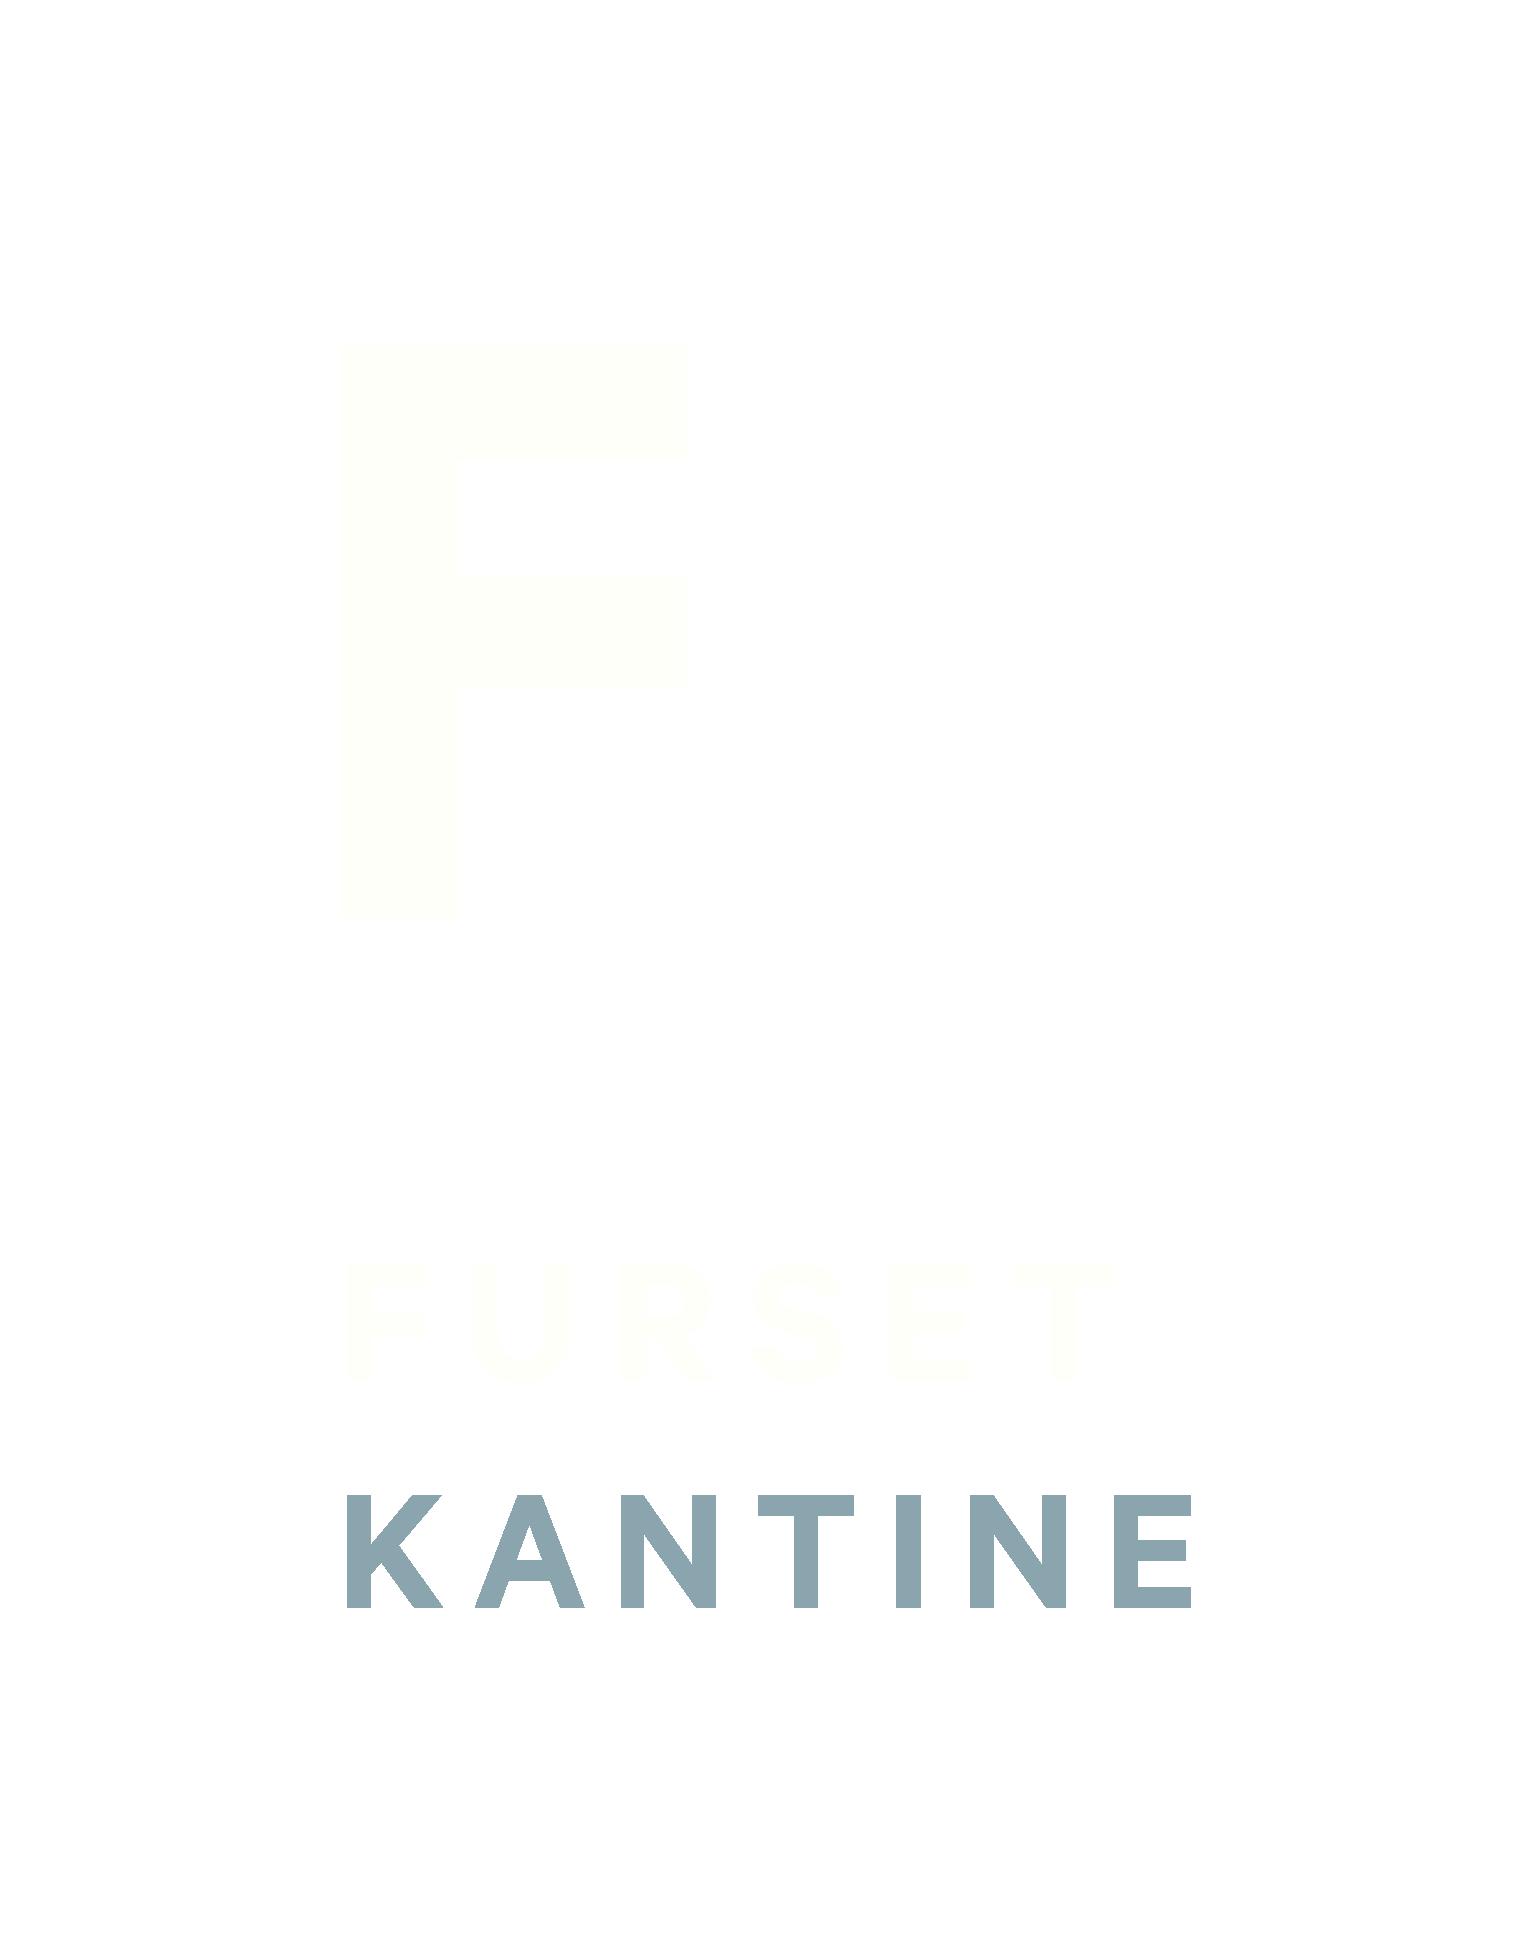 fg_kantine_symbol_vertikal_rgb_negativ